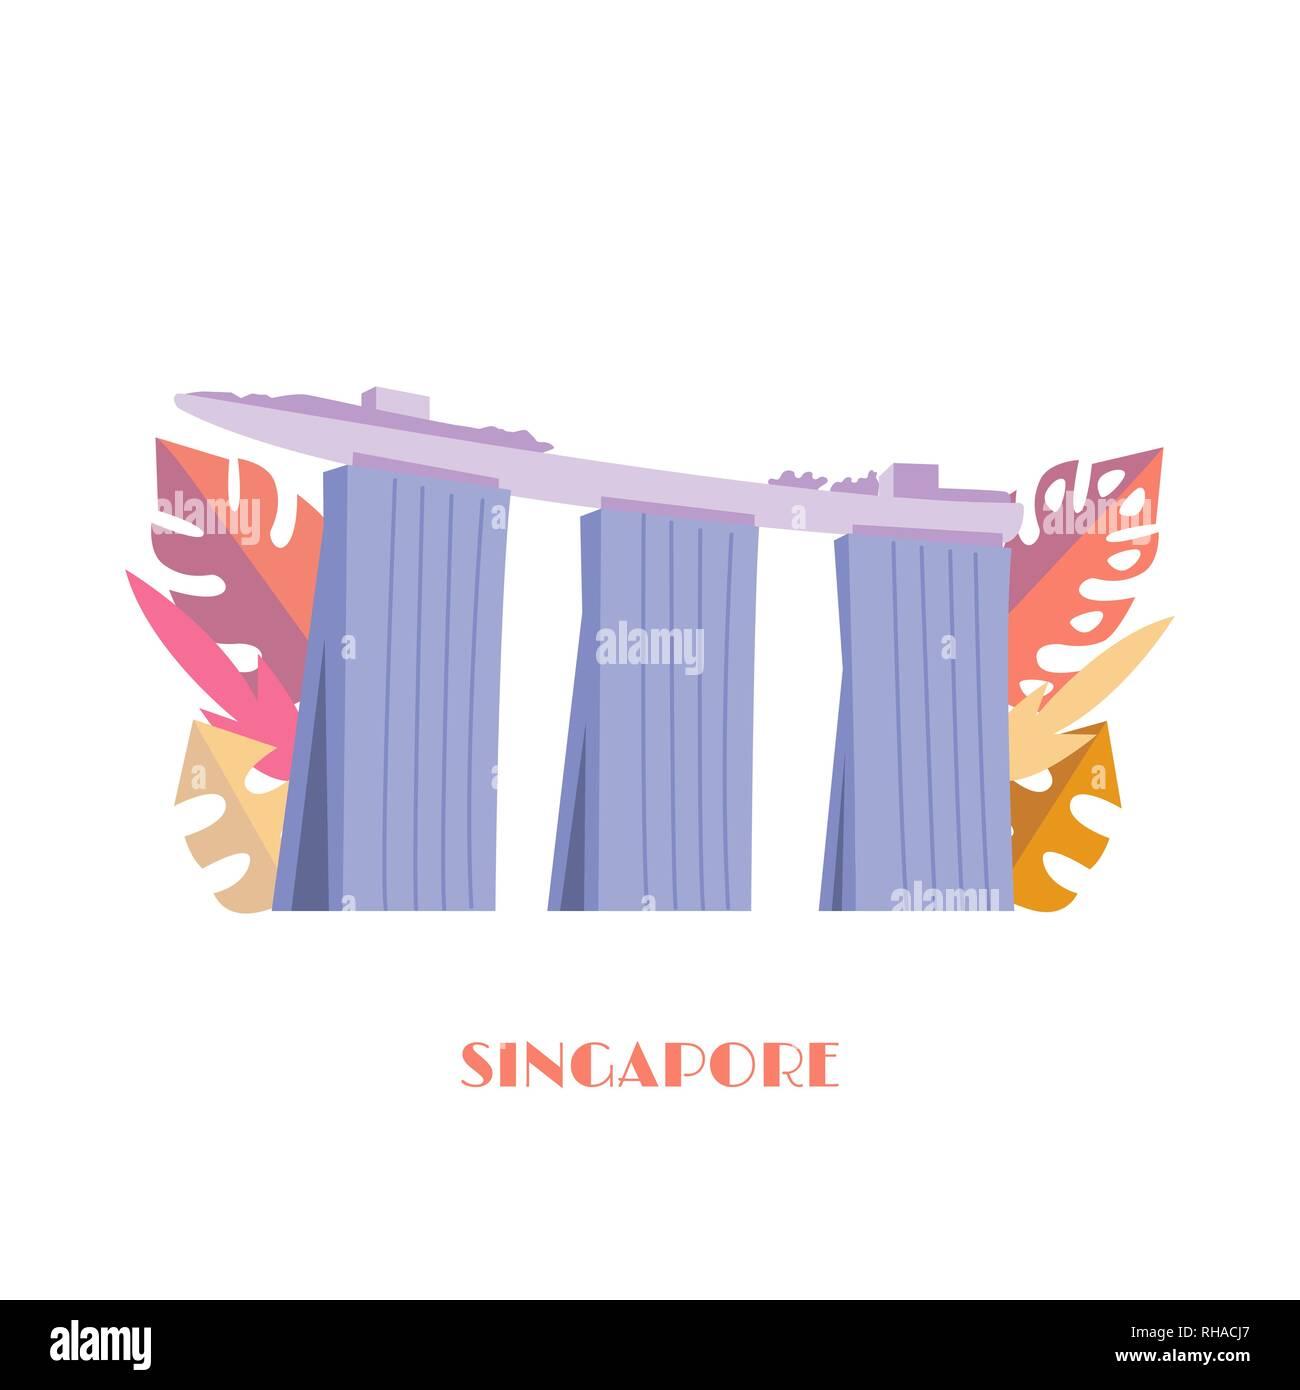 Marina Bay Sands building vector illustration. Singapore landmark. Singapore famous hotel with tropical leaves isolated on white background. - Stock Image